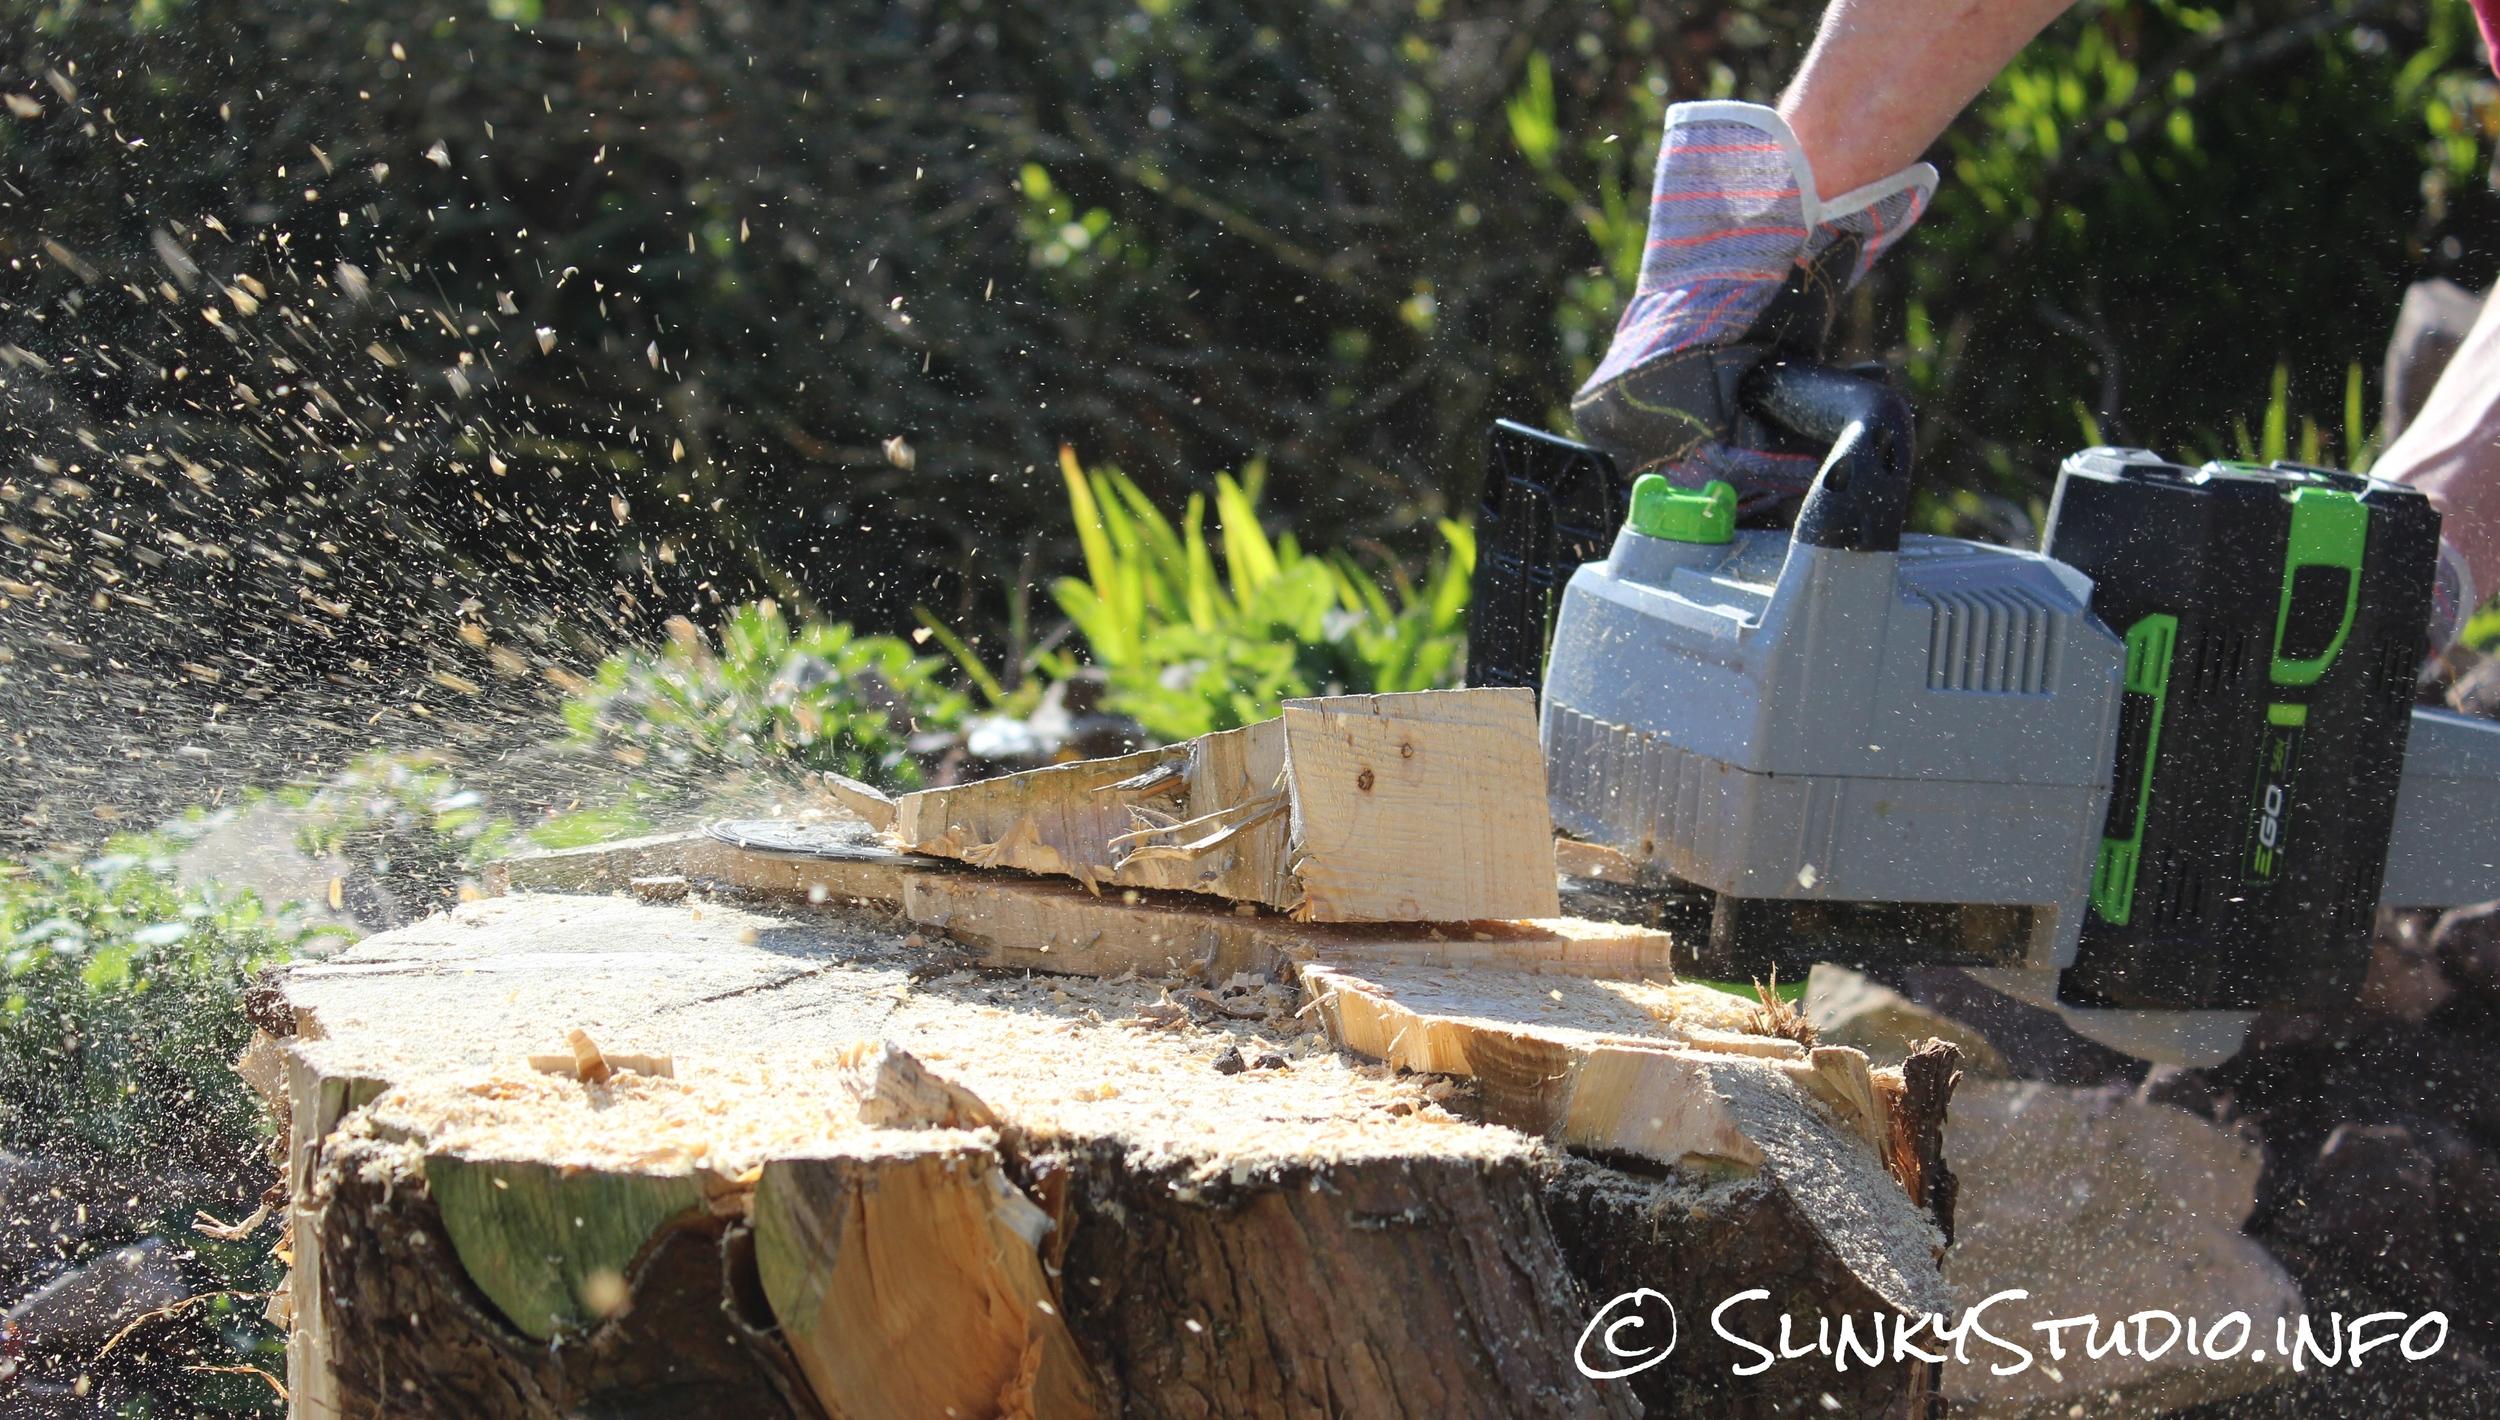 EGO Power+ Cordless Chainsaw Sideways Cutting Fast Shutter Speed Saw Dust